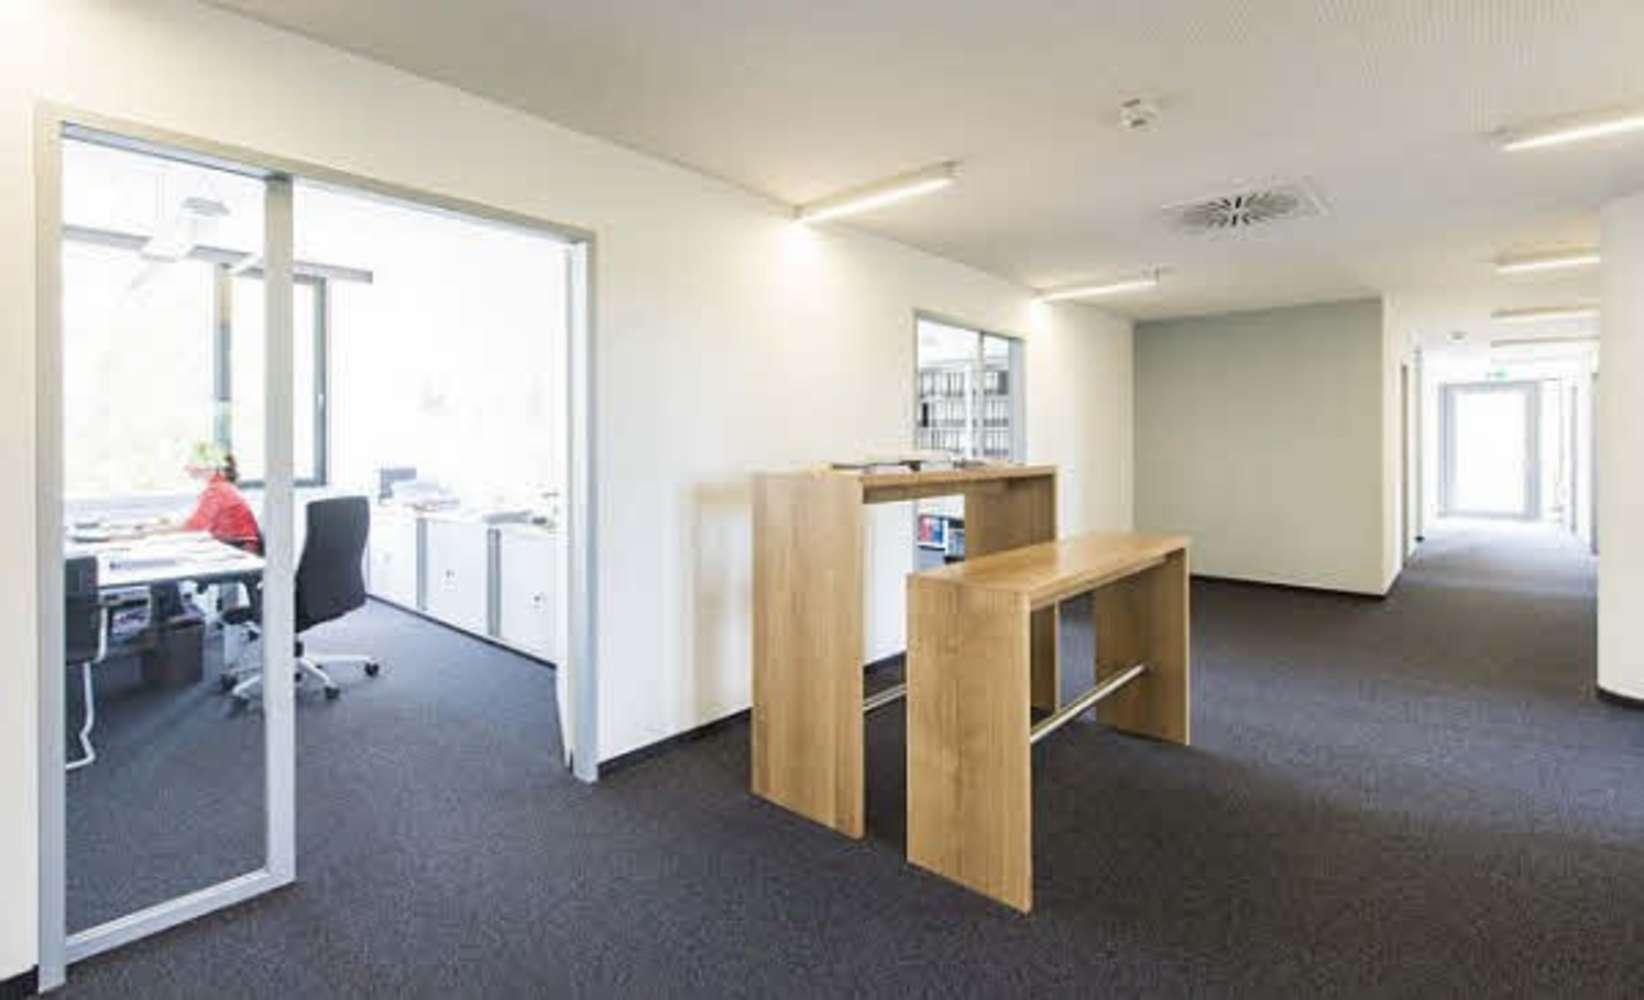 Büros Frankfurt am main, 60528 - Büro - Frankfurt am Main, Goldstein - F1147 - 9620965